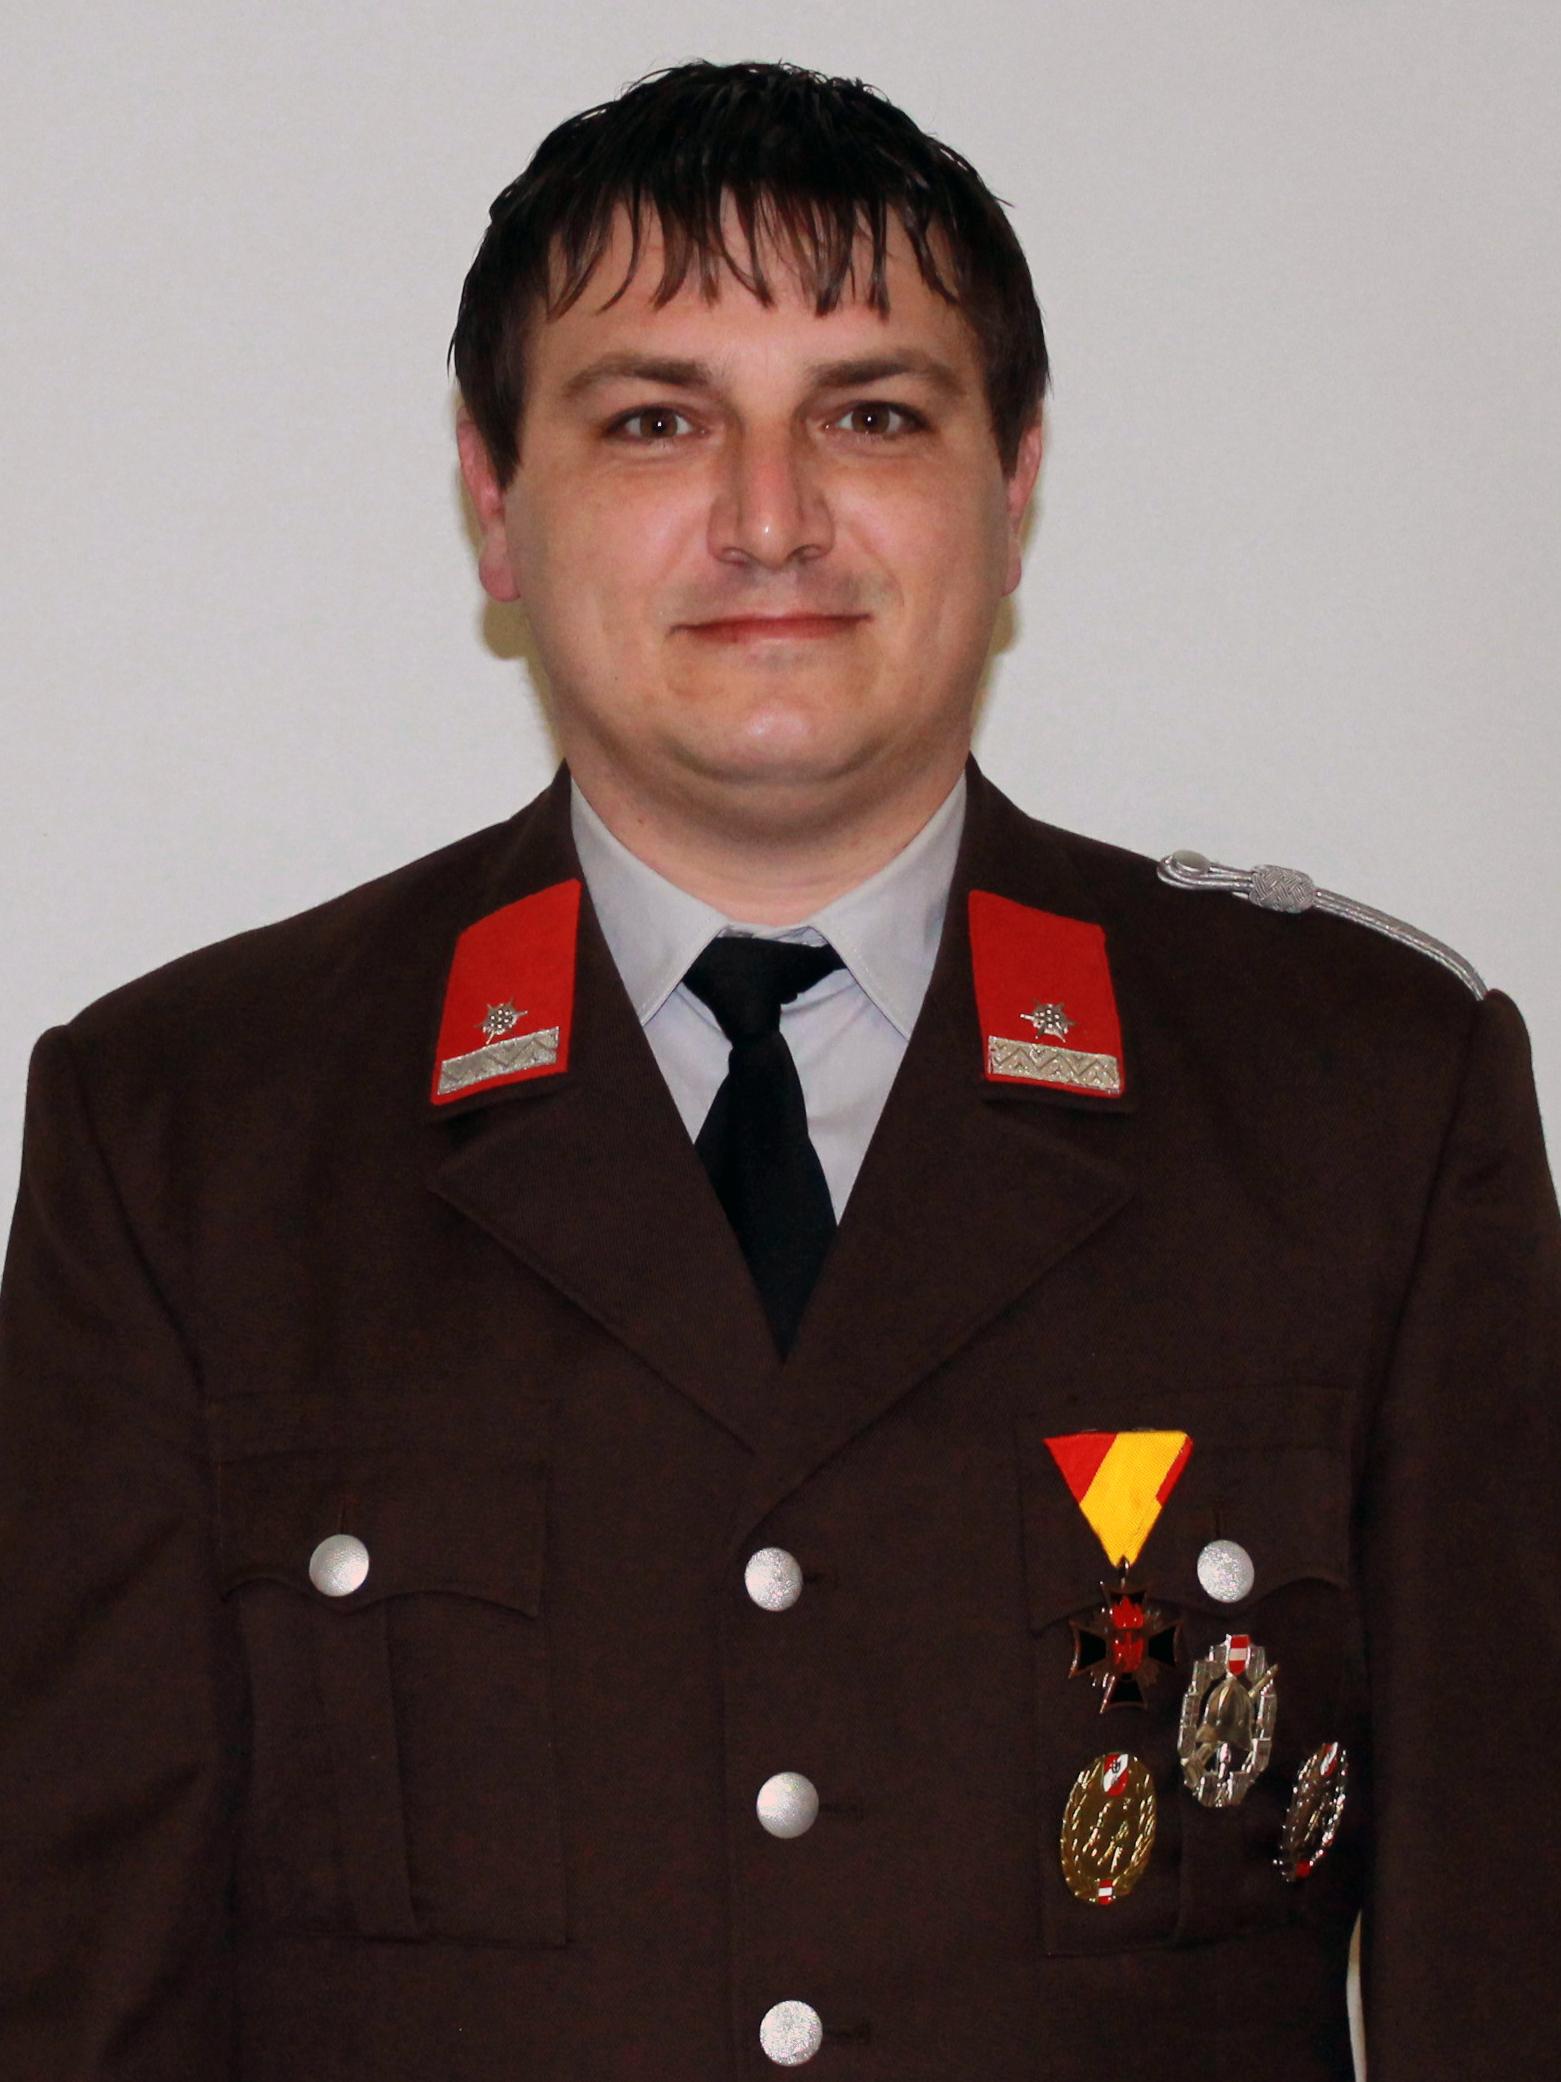 LM Samer Martin II